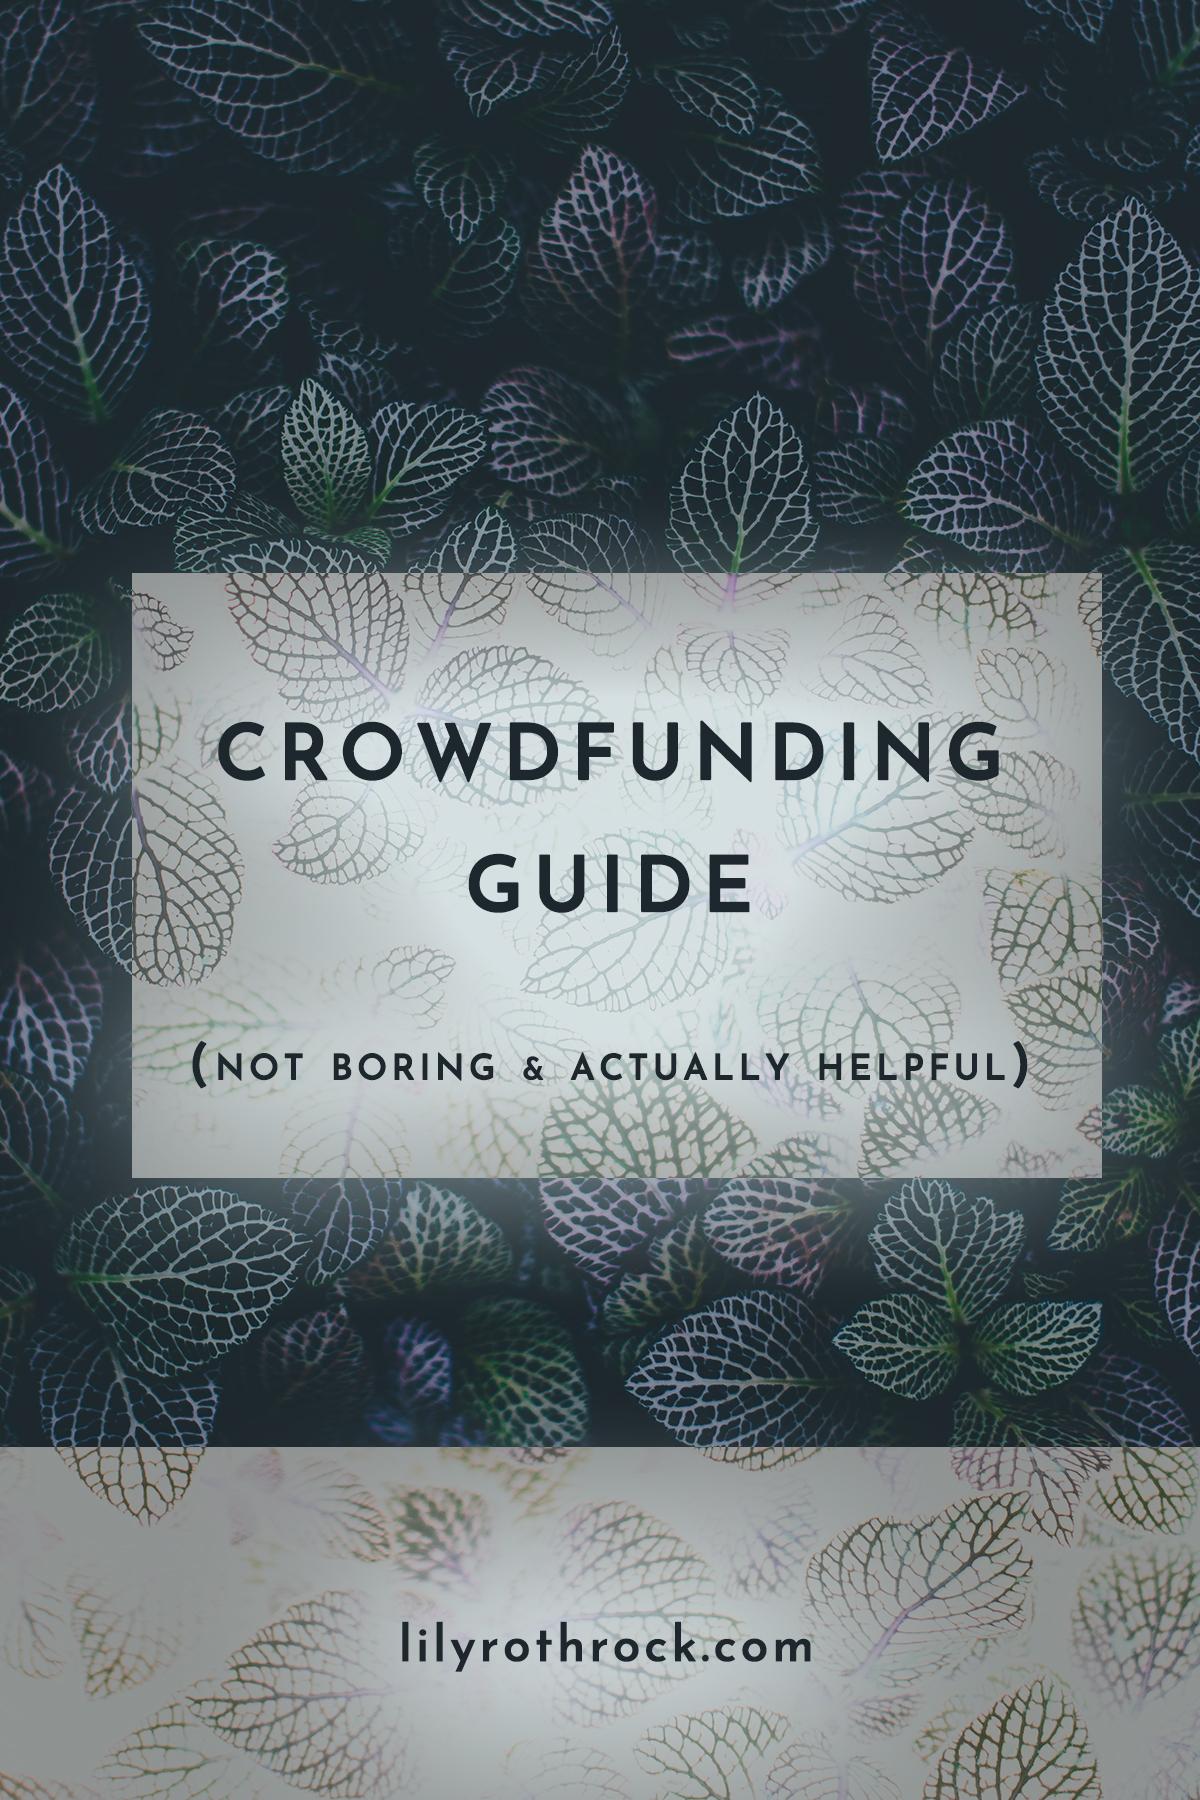 crowdfunding guide.jpg